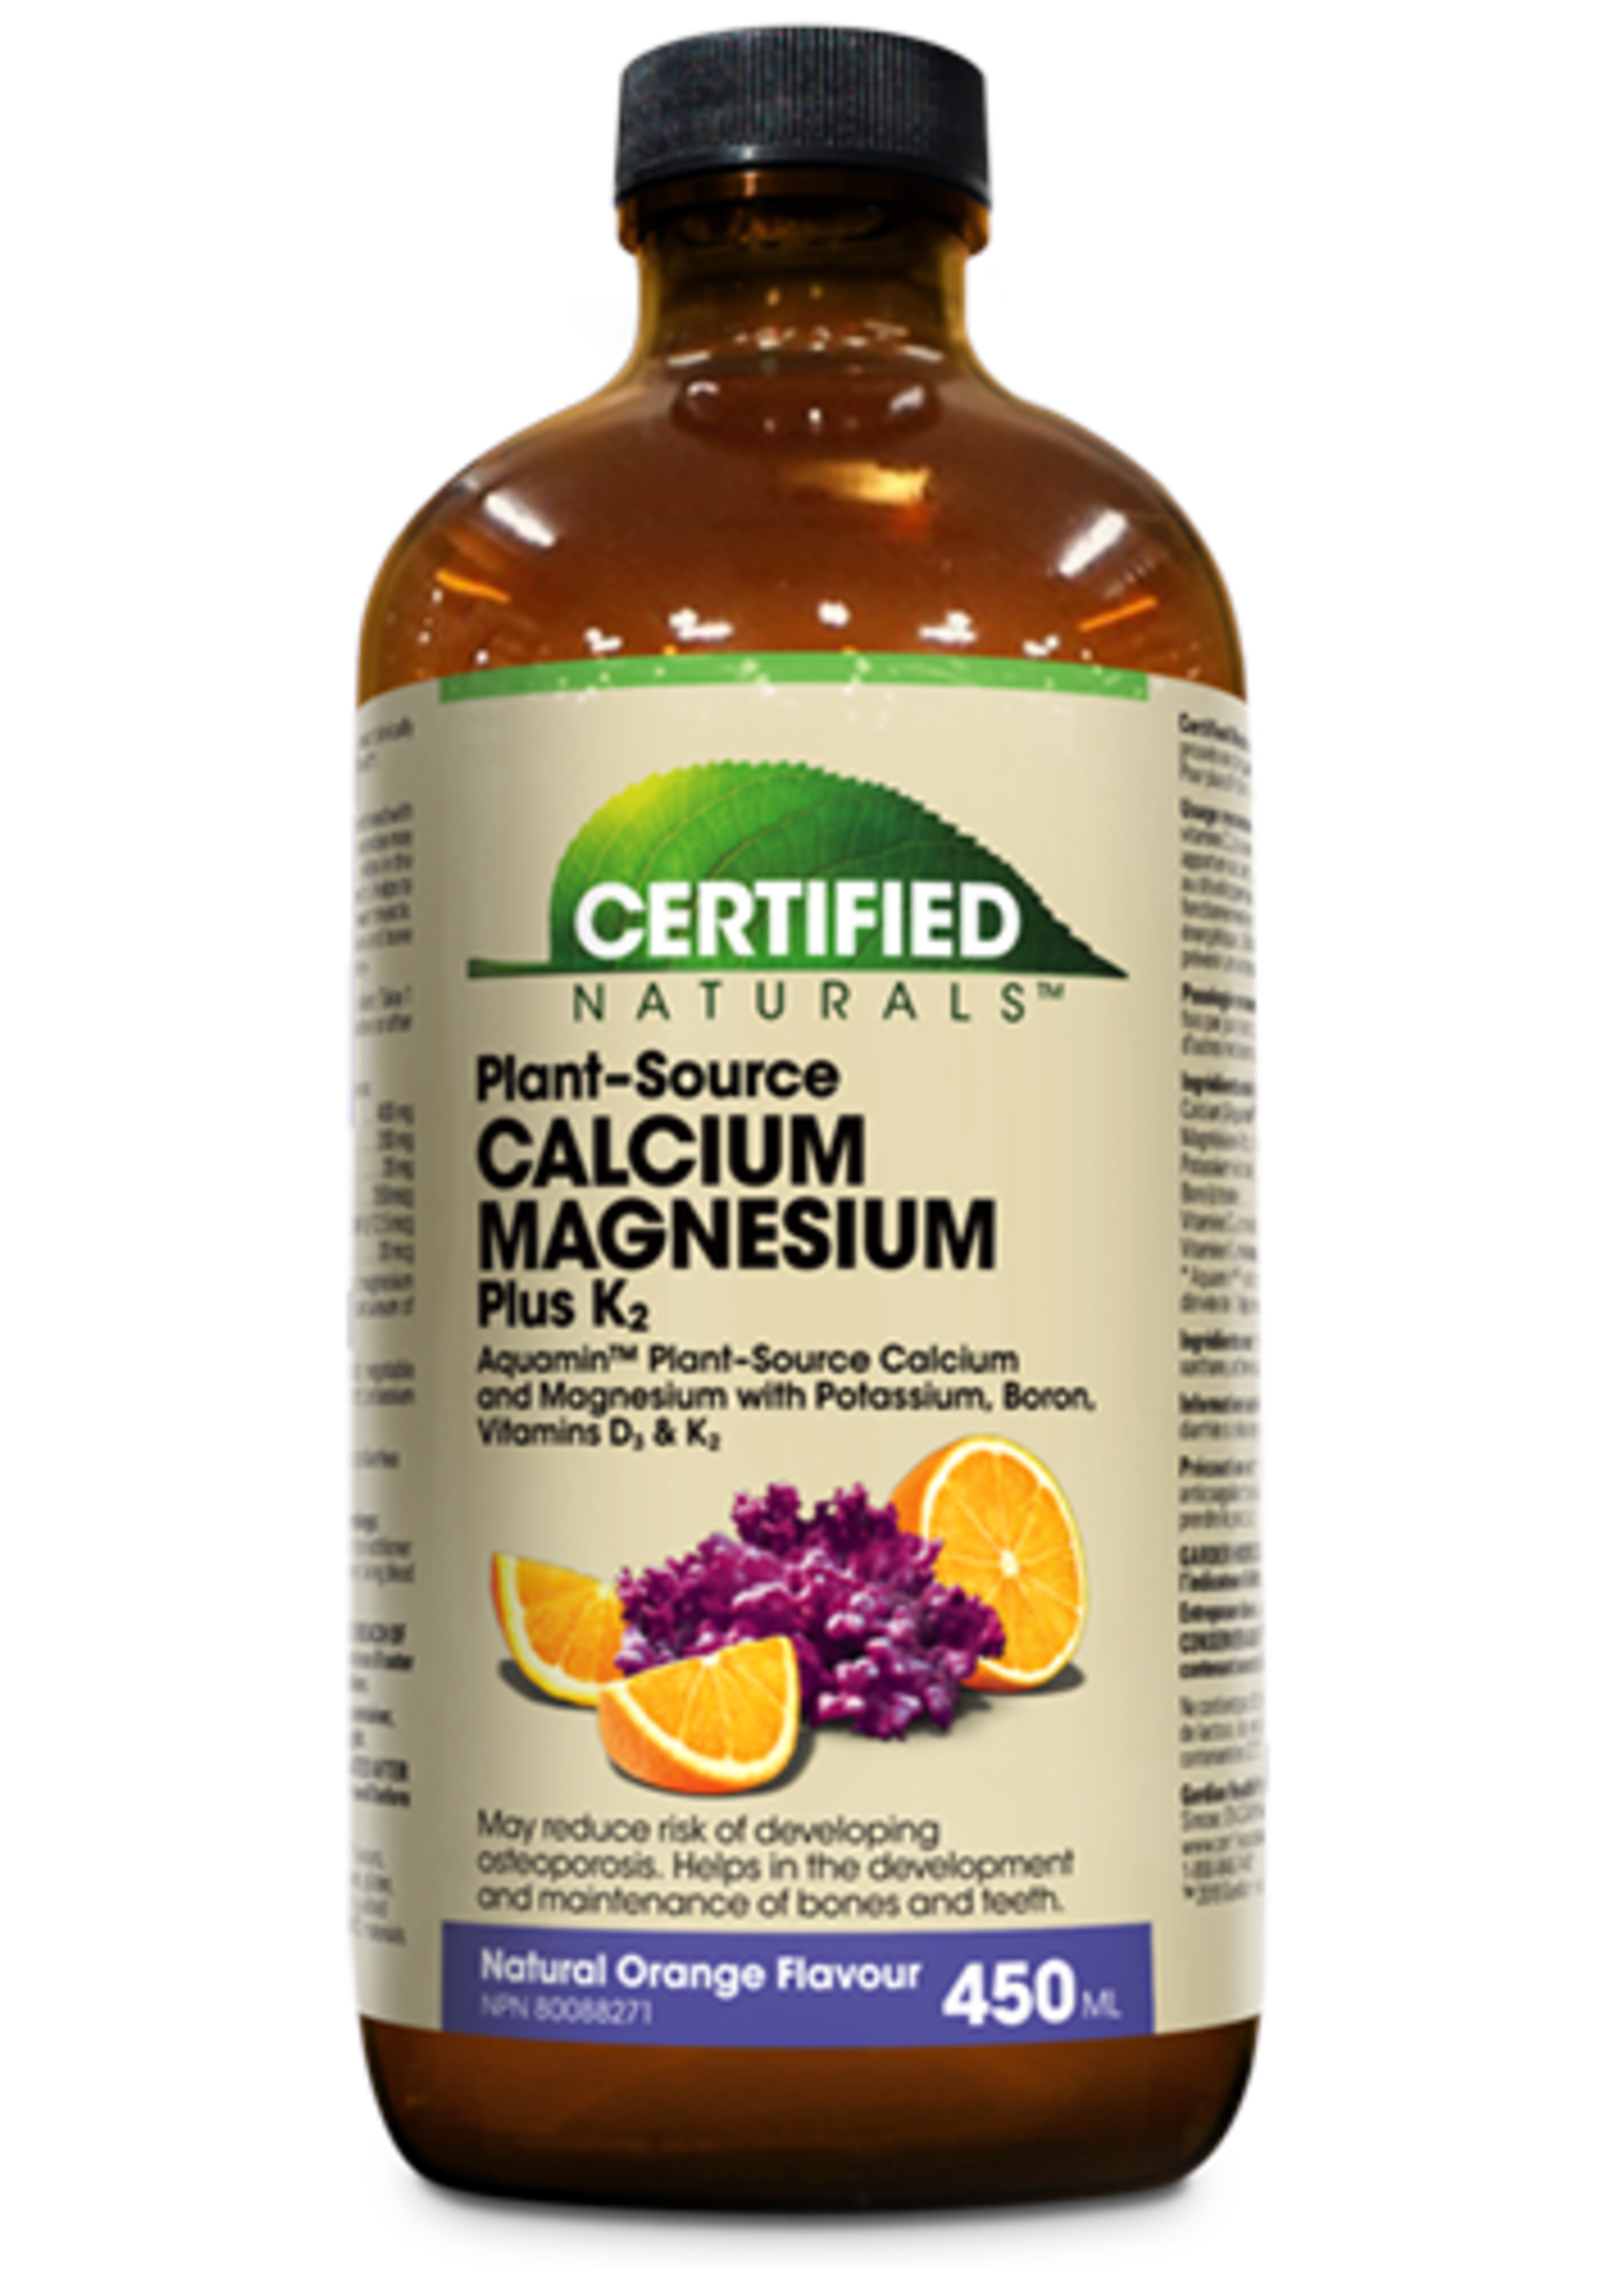 Certified Naturals Certified Naturals Cal-Mag Liquid Orange 450ml